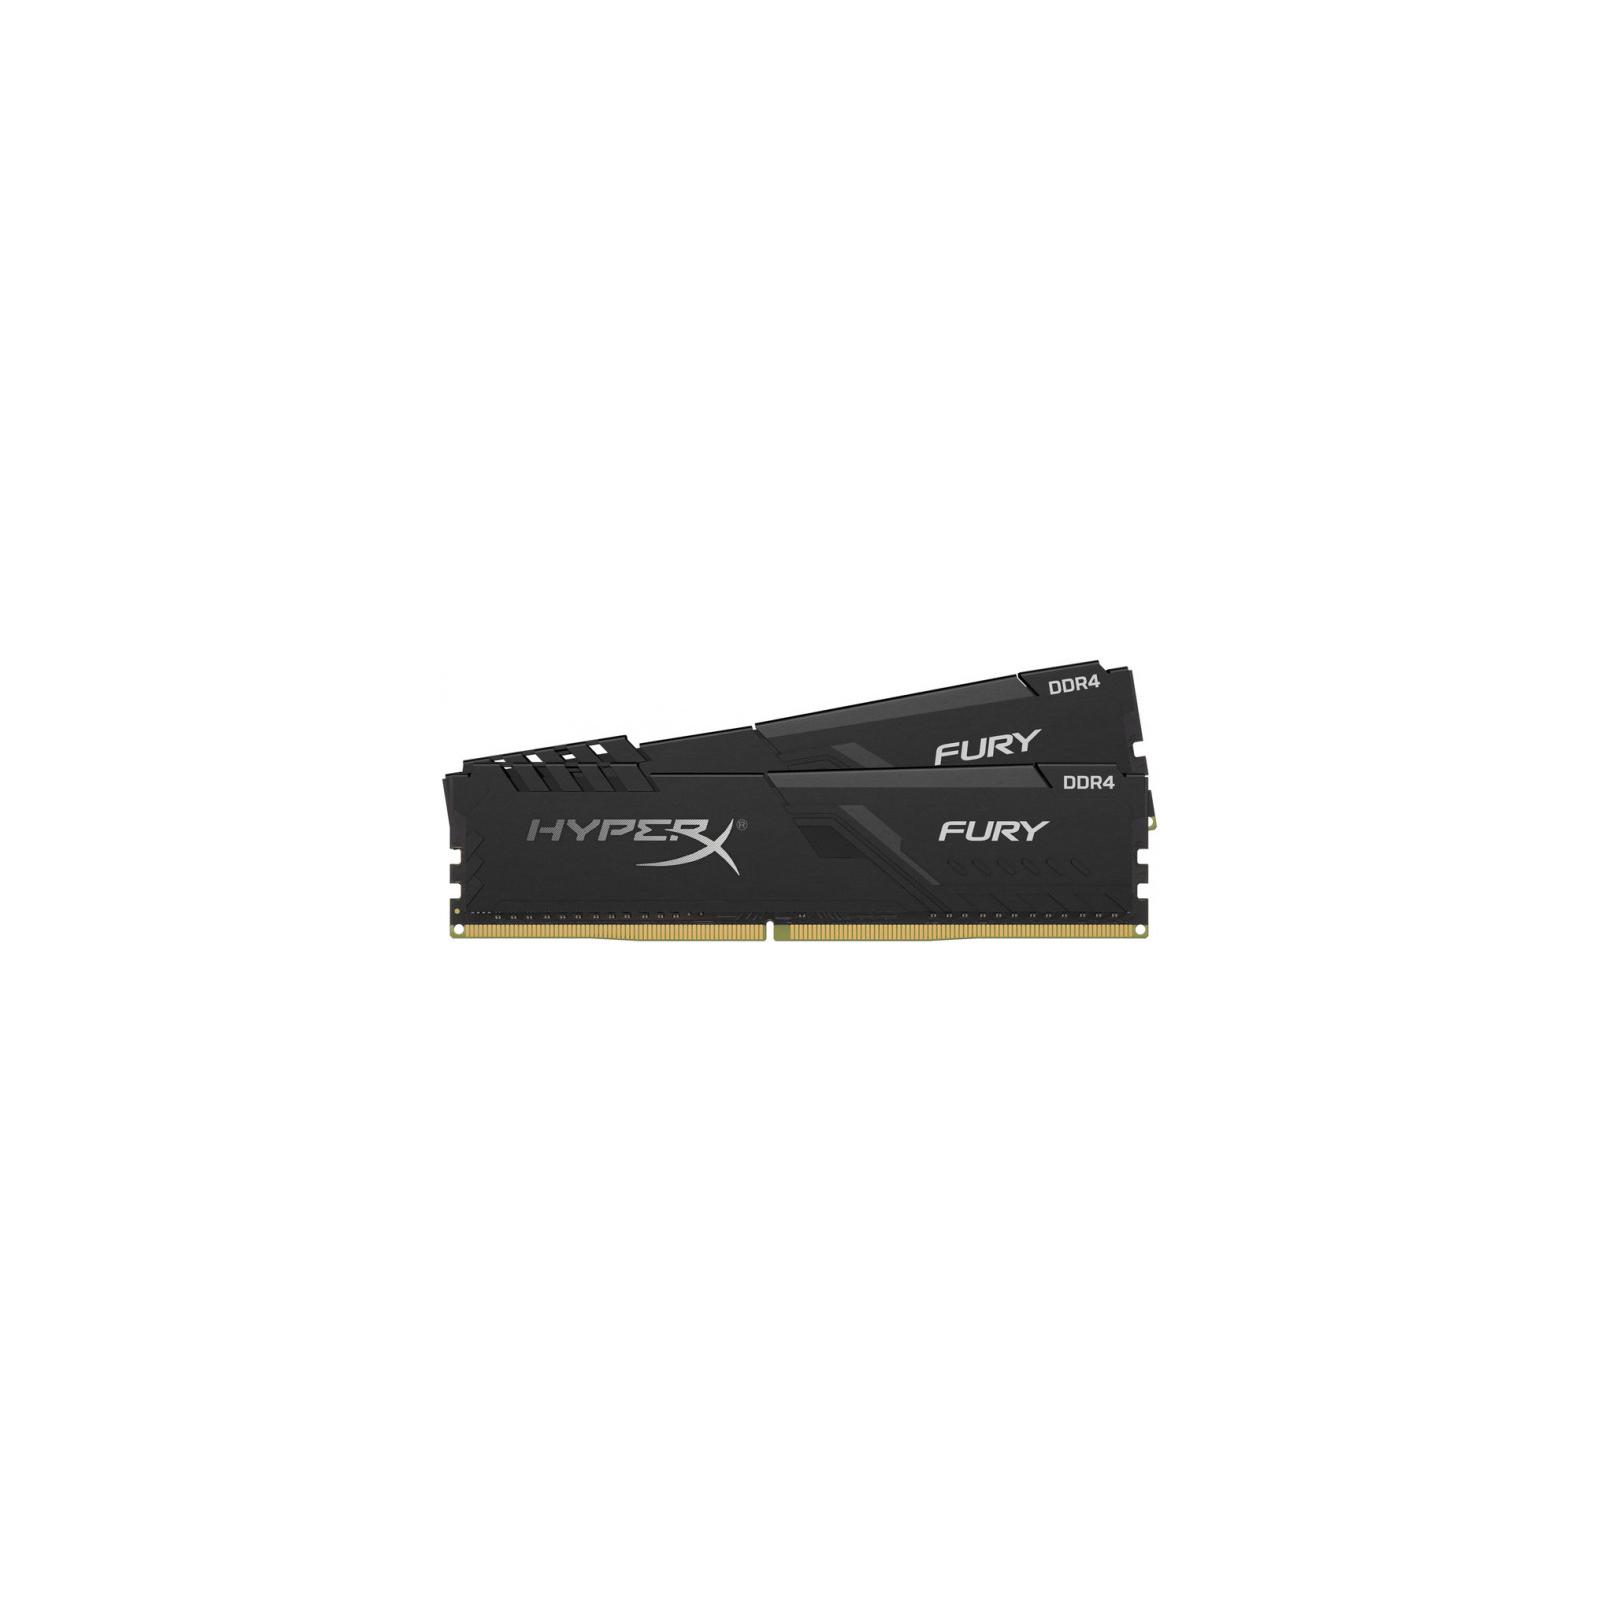 Модуль памяти для компьютера DDR4 8GB (2x4GB) 2666 MHz HyperX Fury Black HyperX (Kingston Fury) (HX426C16FB3K2/8) изображение 2